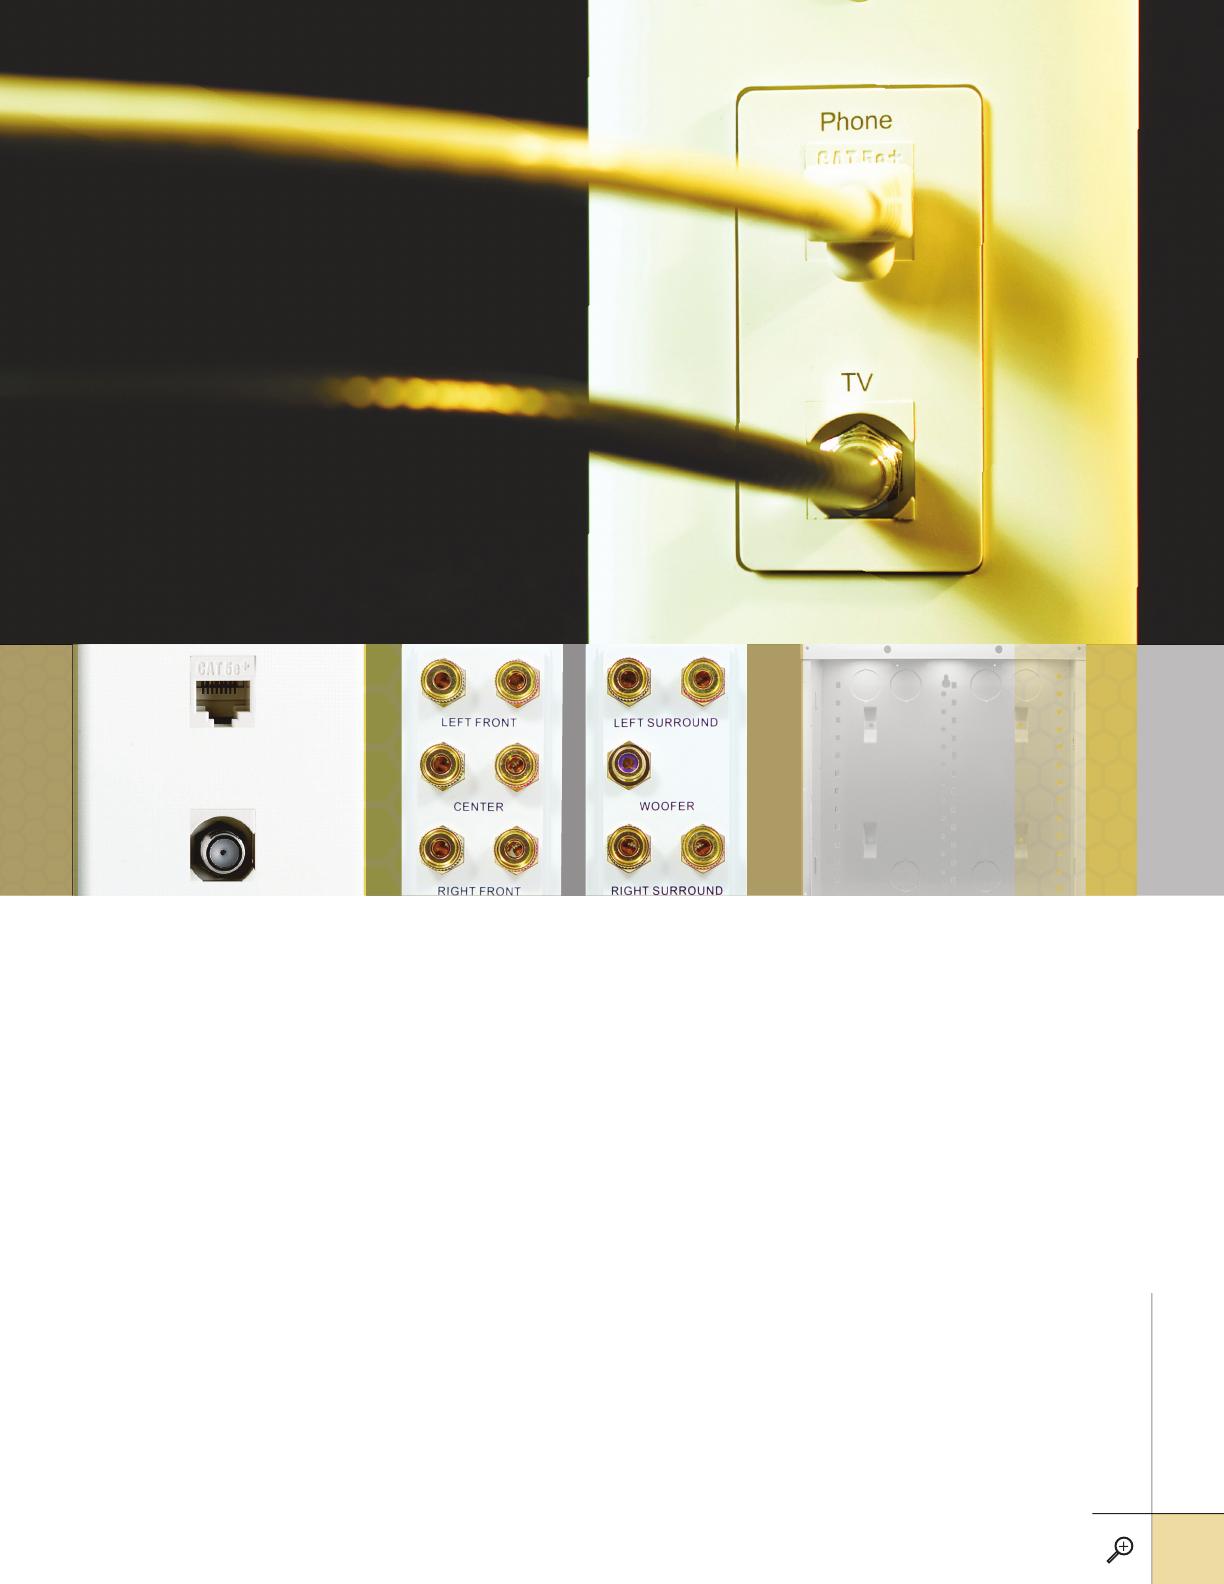 61653 Catalog Onq Wiring Diagram Us